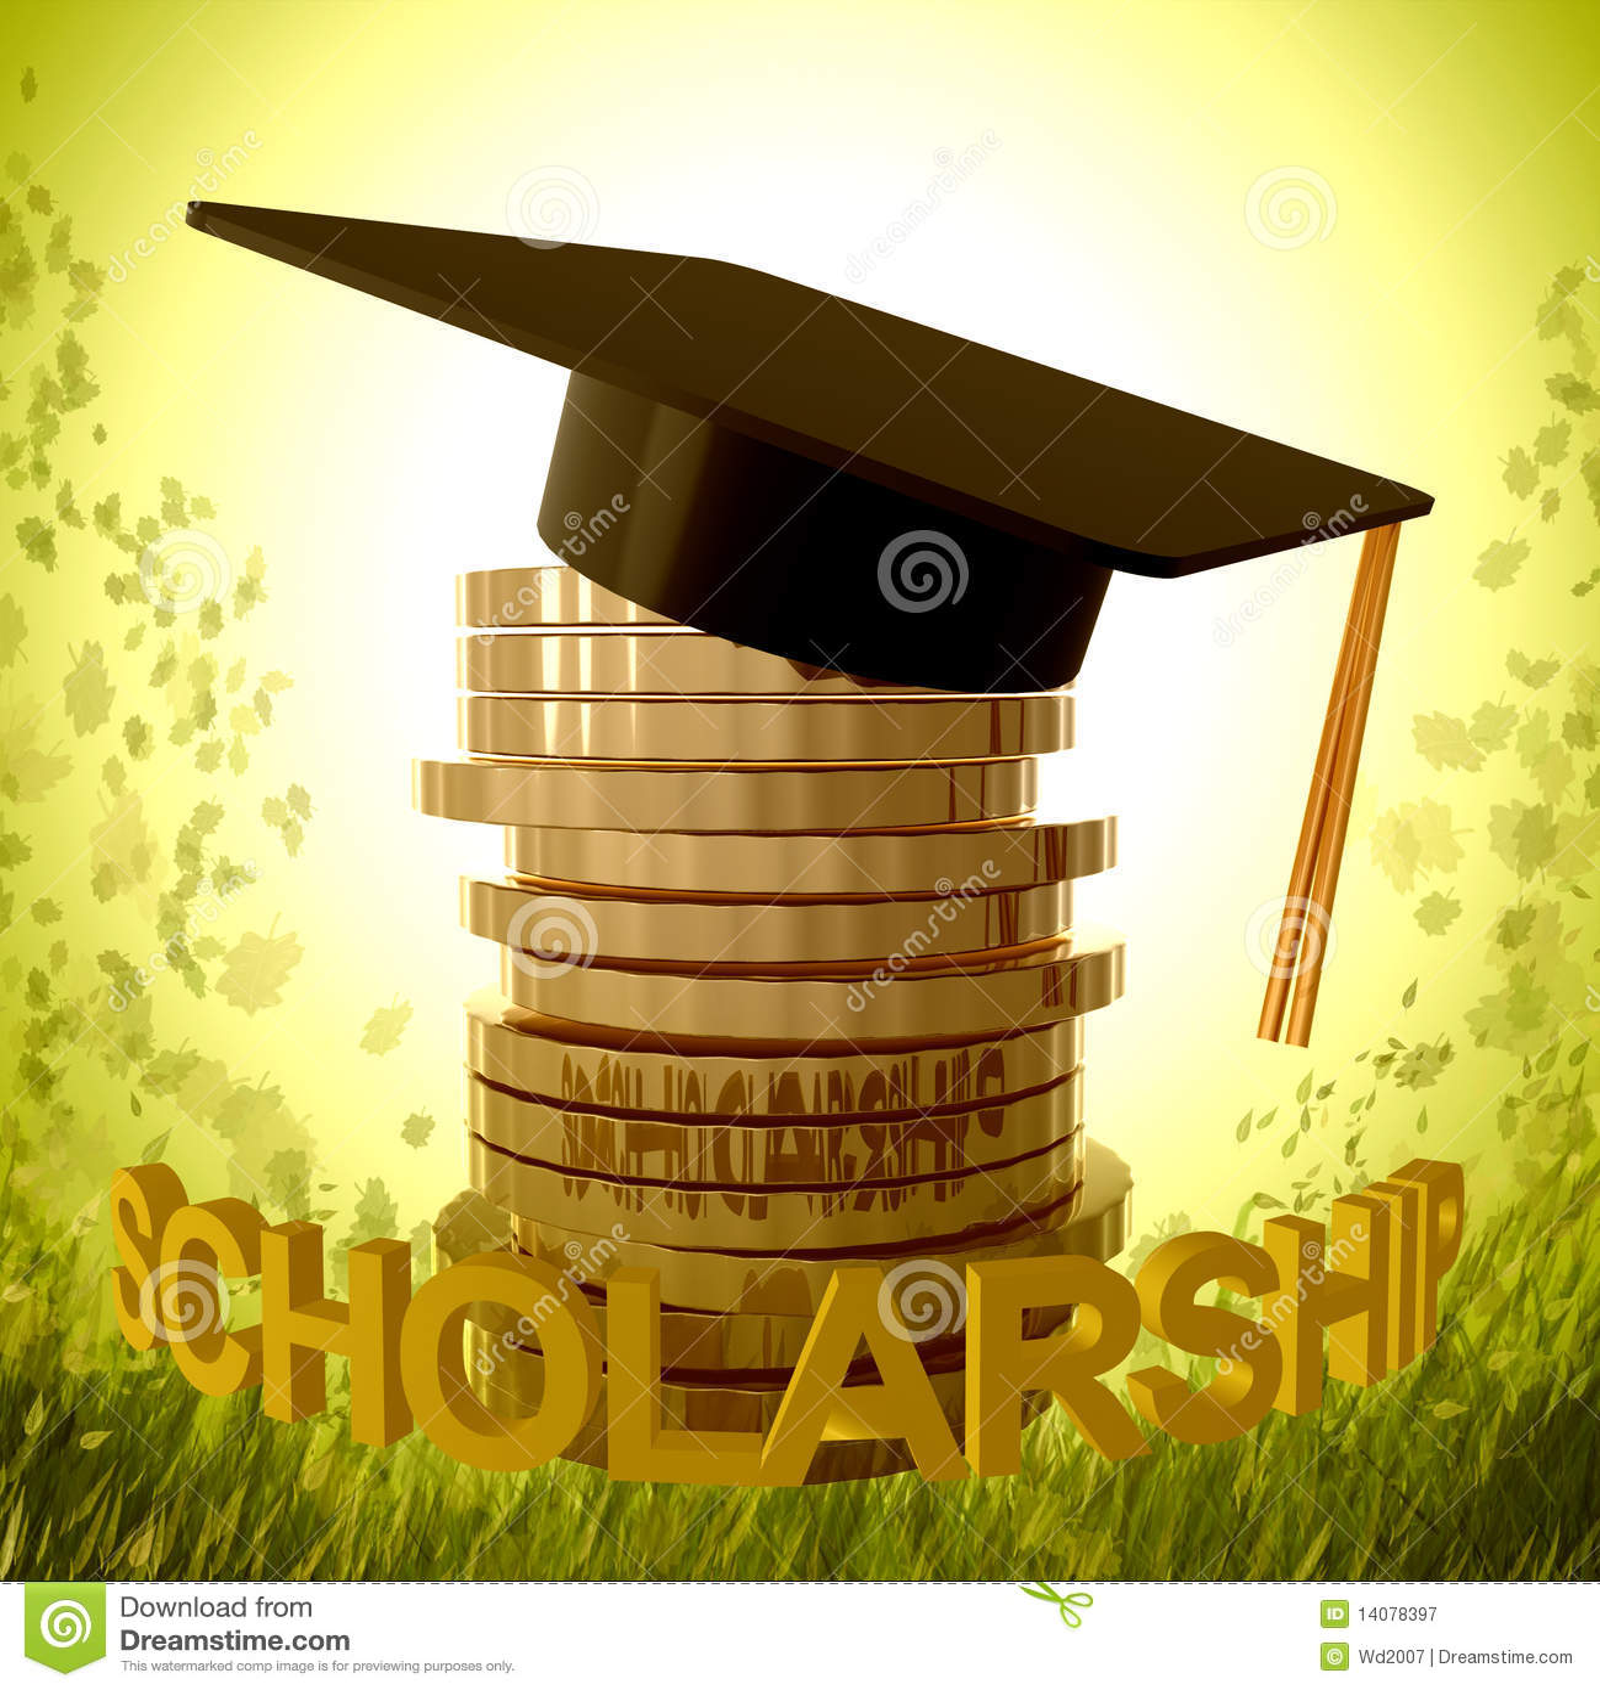 scholarship fund and graduation symbol royalty free stock